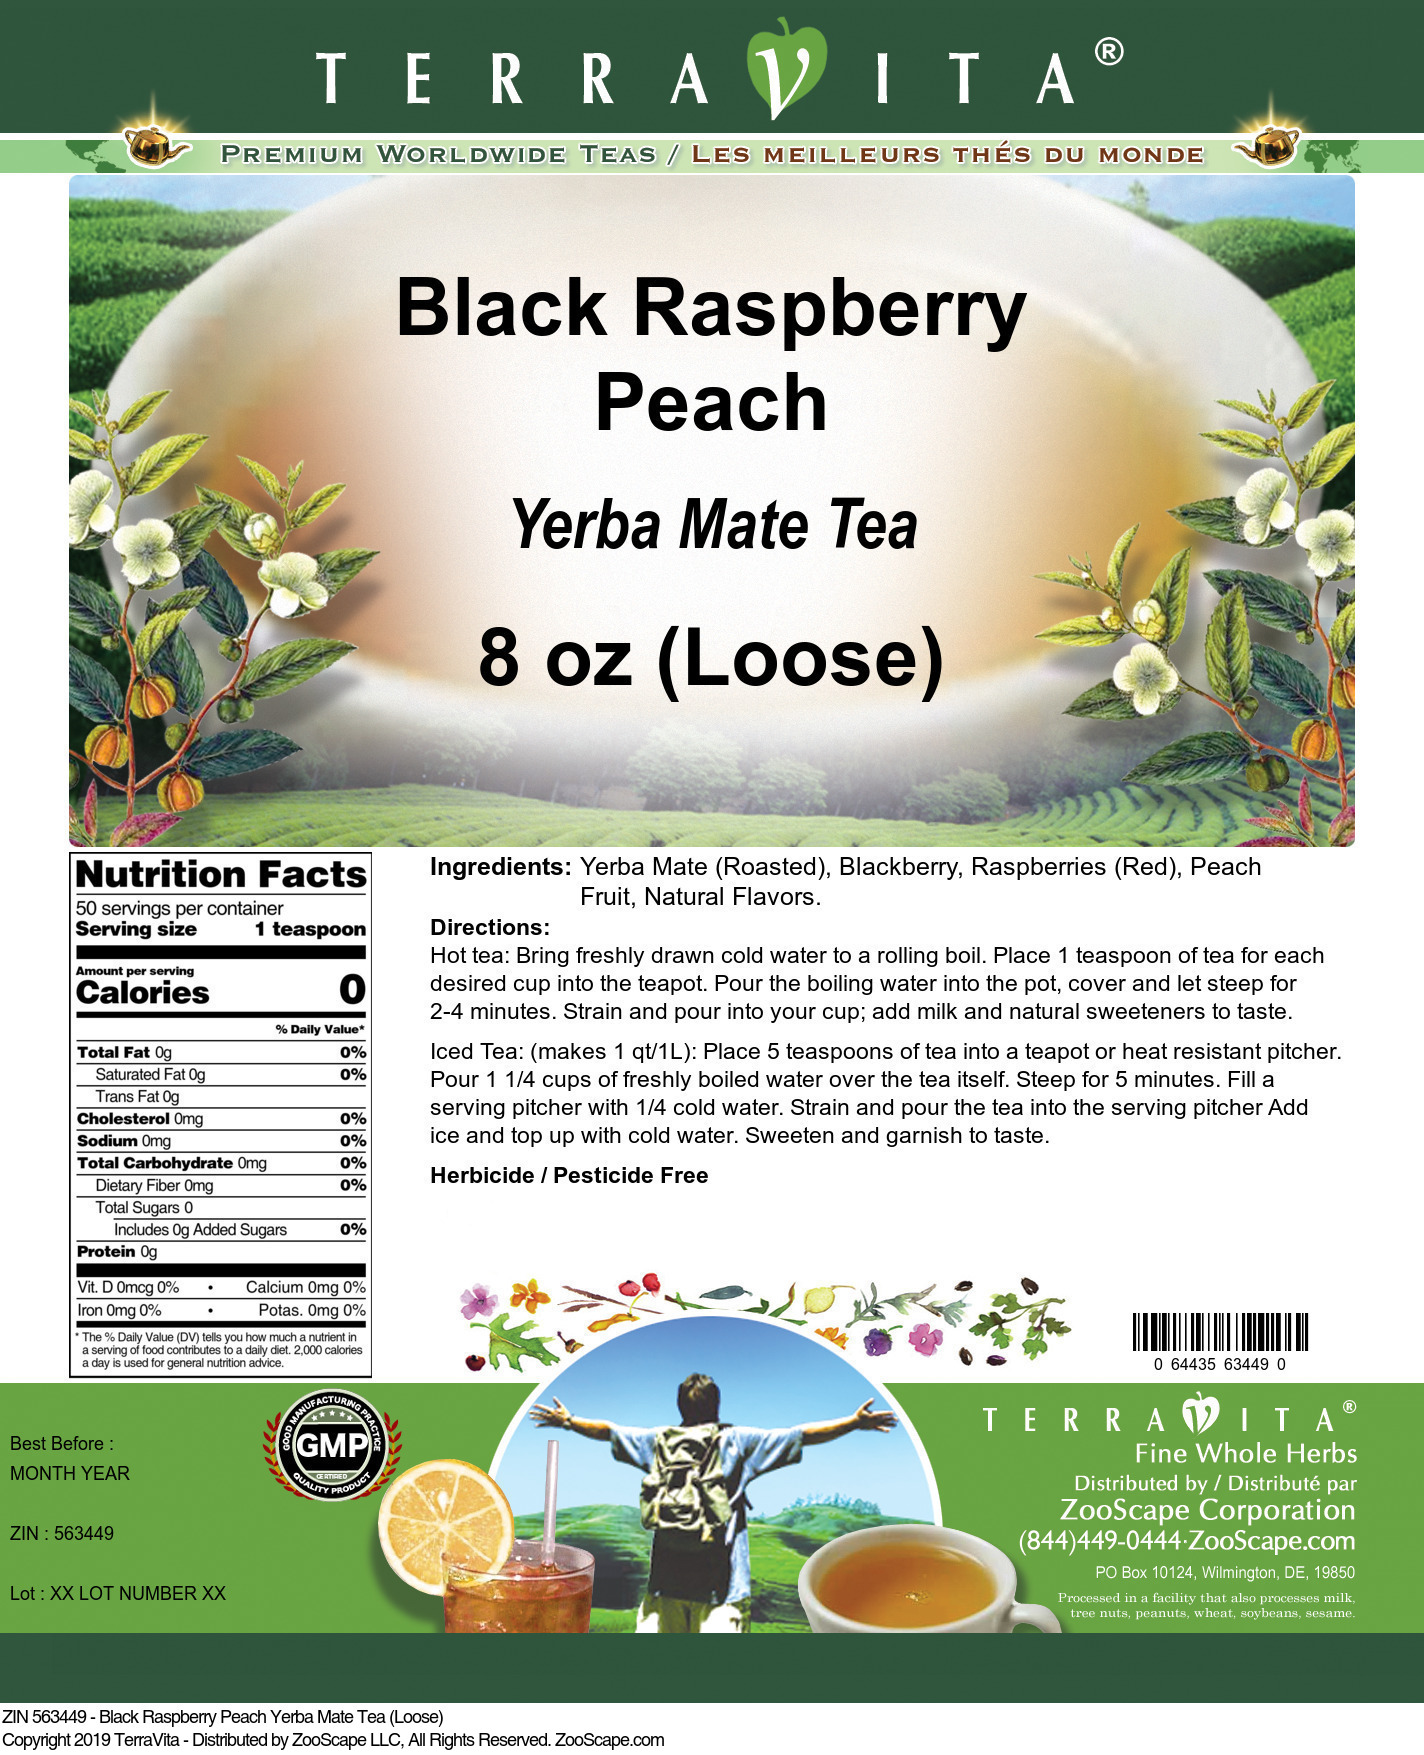 Black Raspberry Peach Yerba Mate